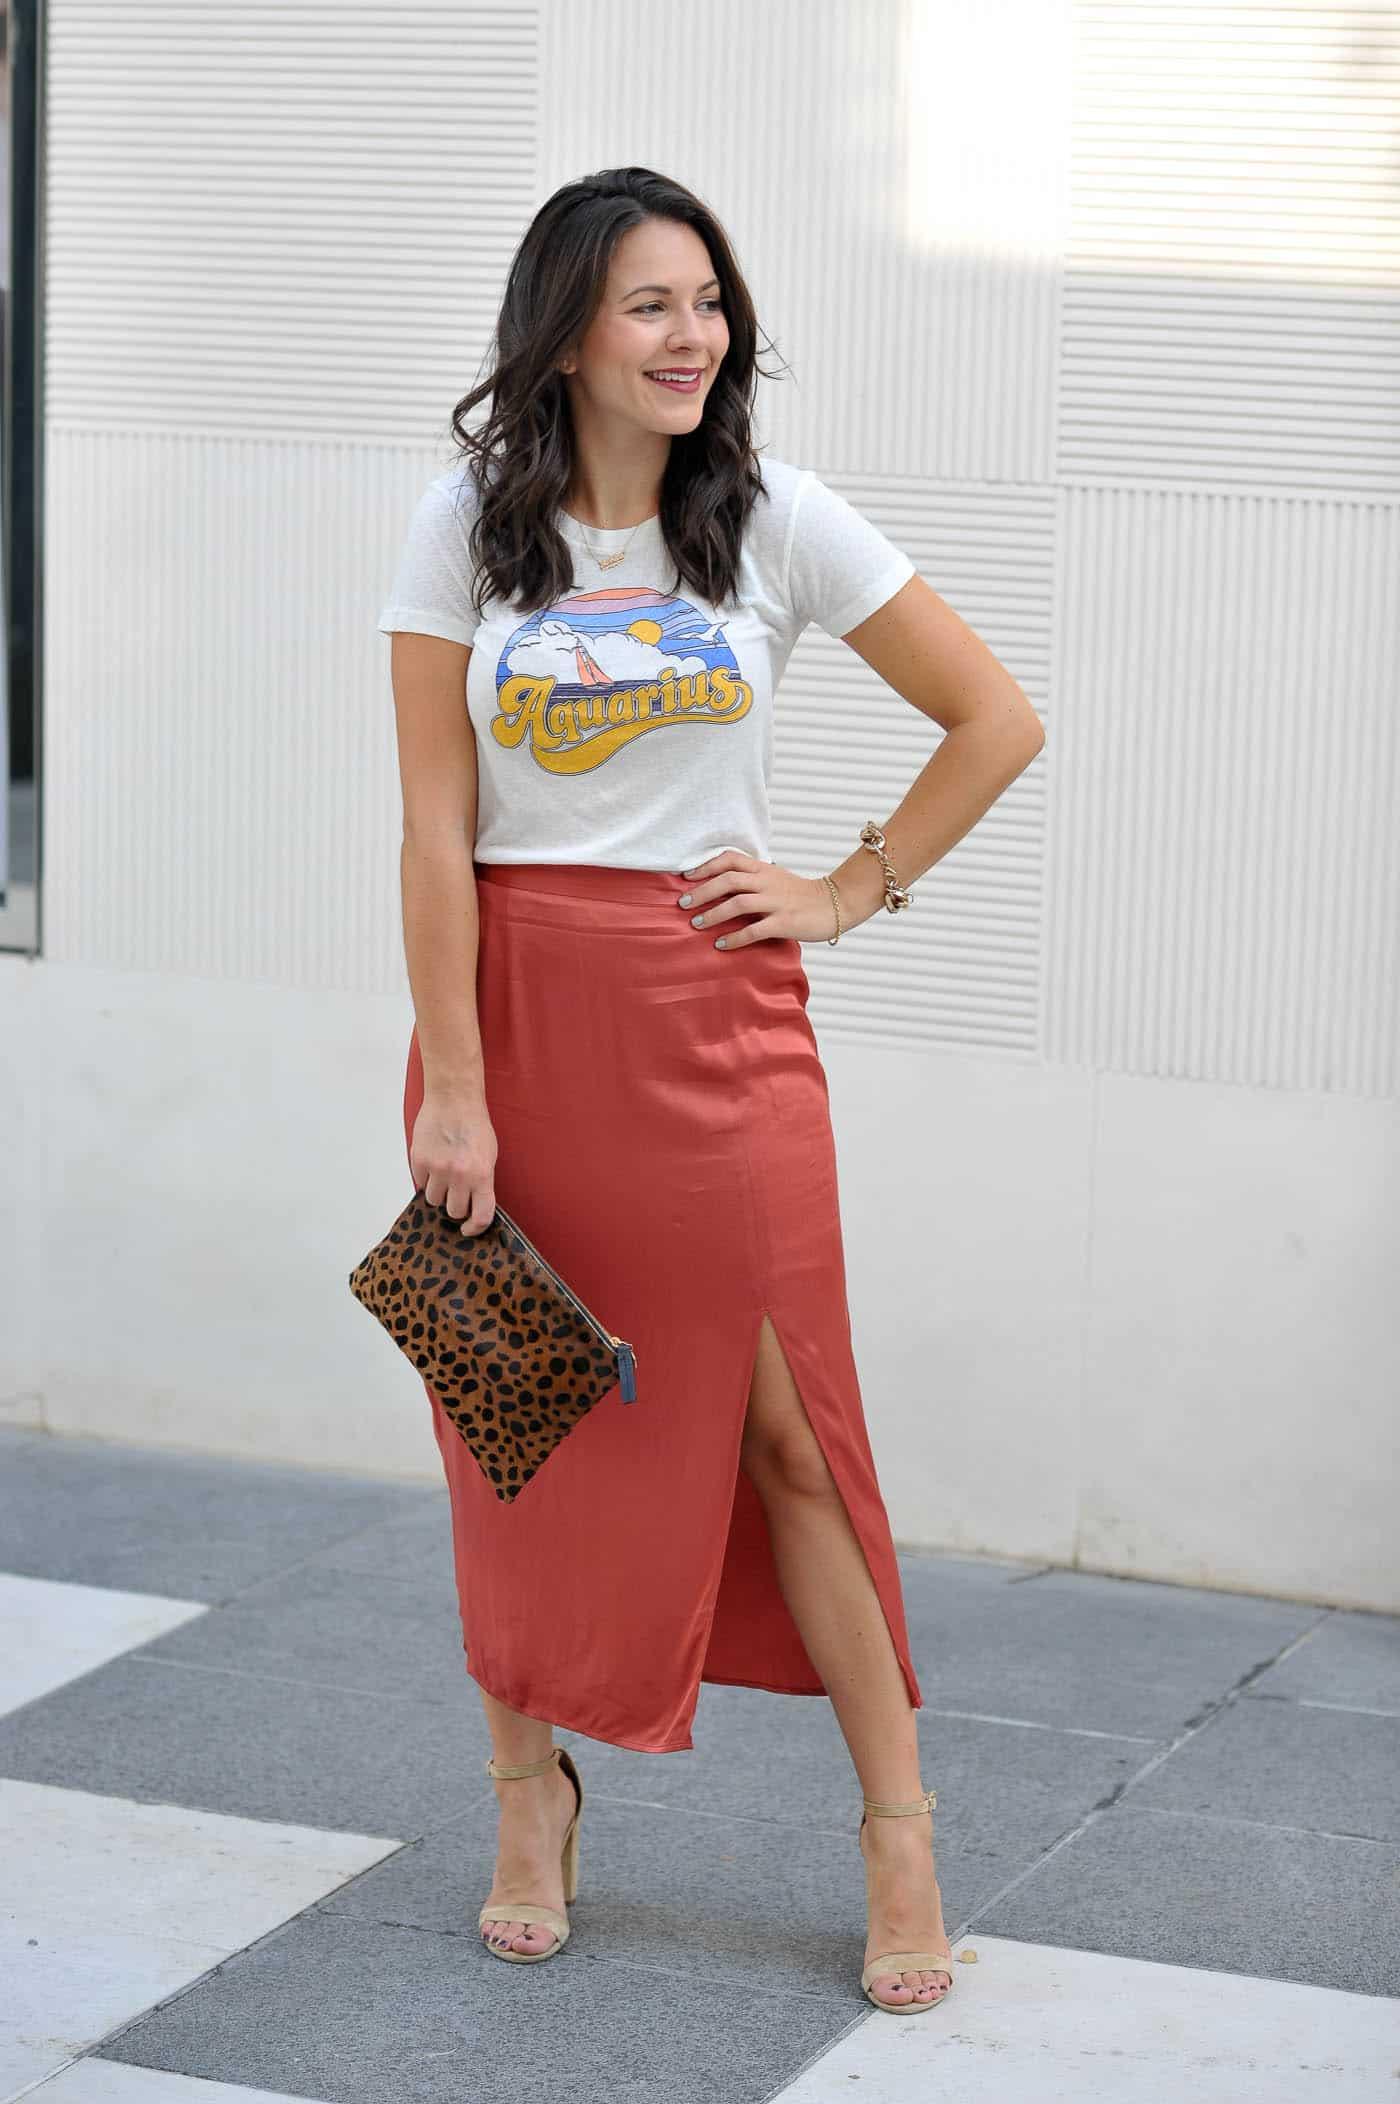 Aquarius Graphic Tee, how to style a silk midi skirt - My Style Vita @mystylevita